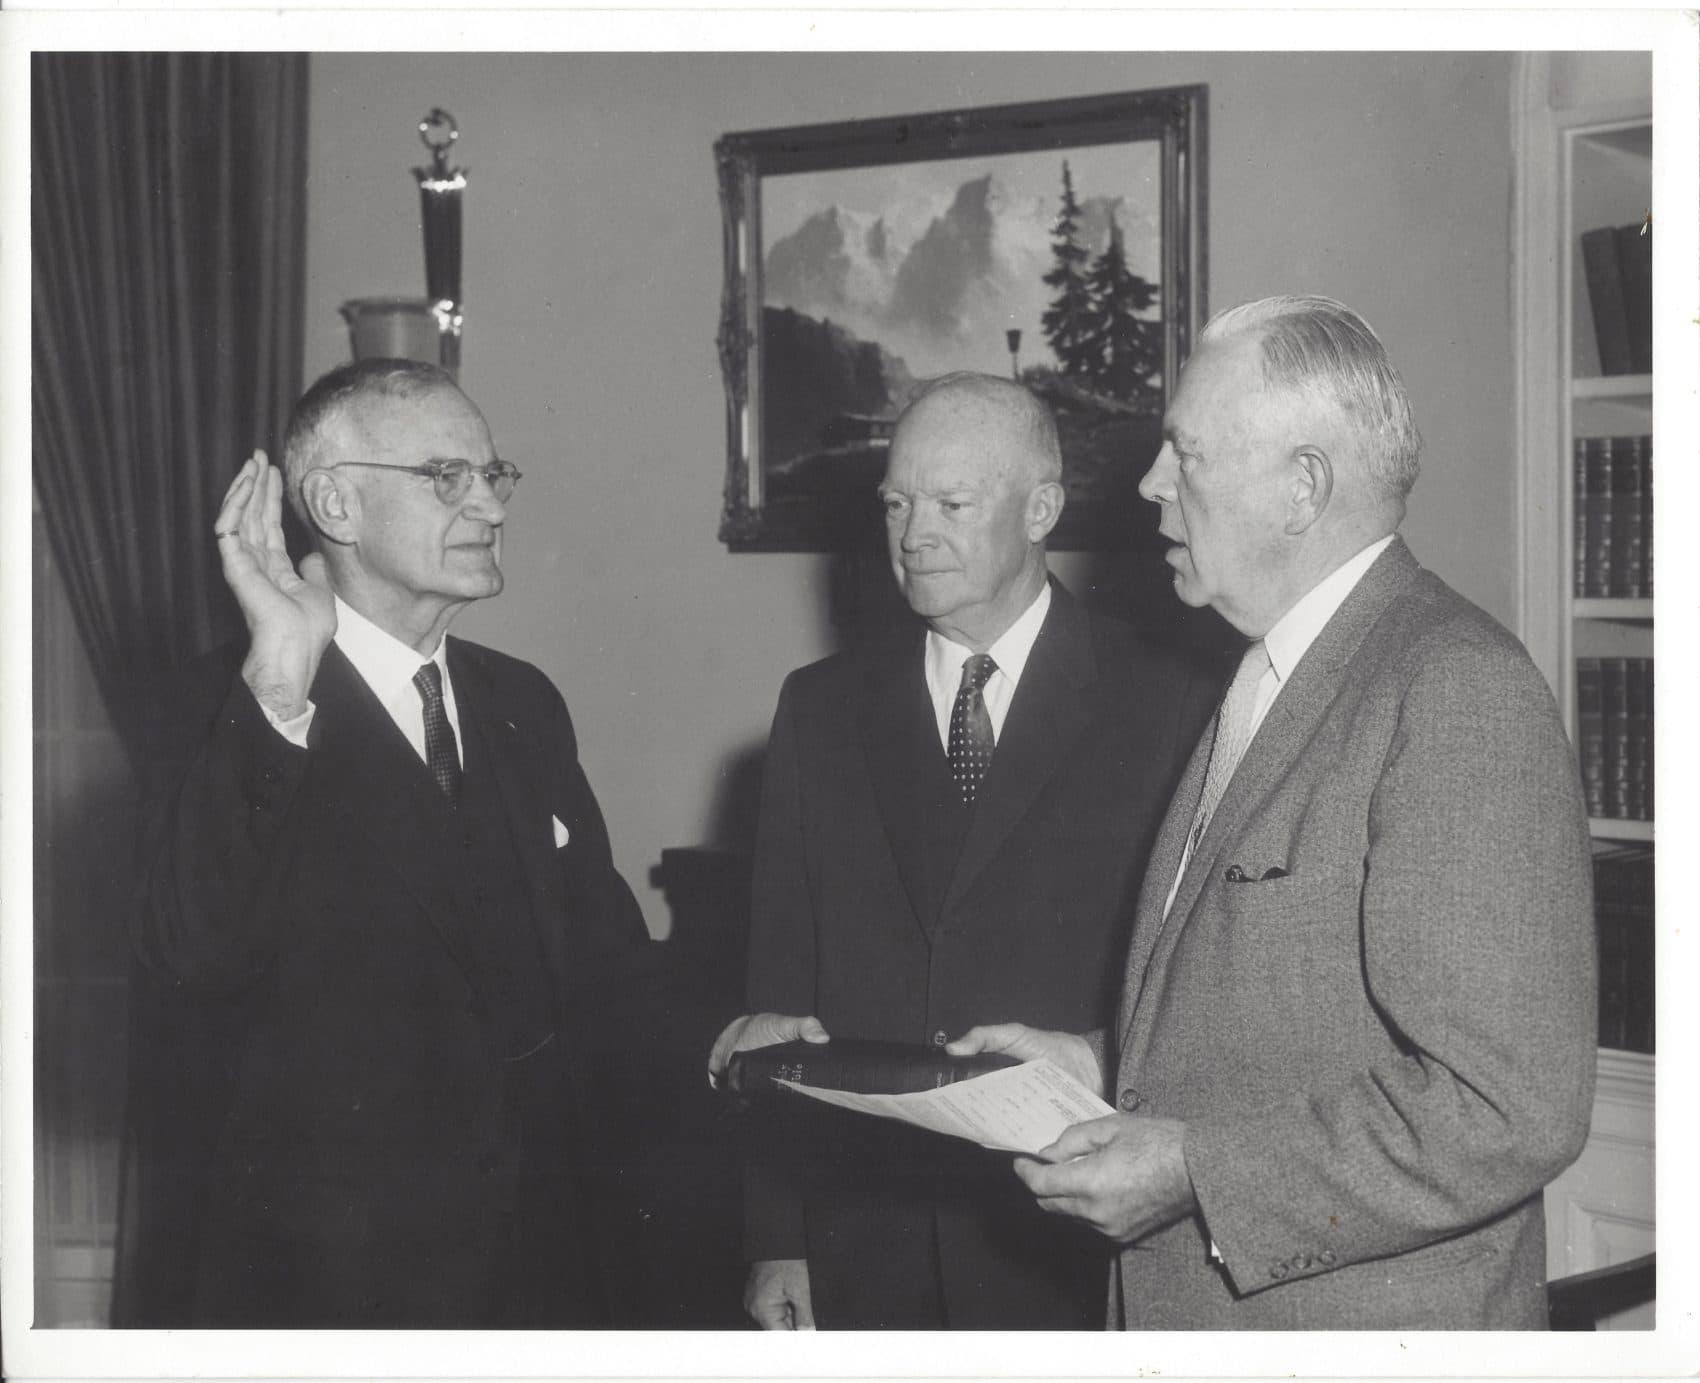 Eisenhower gays and lesbians